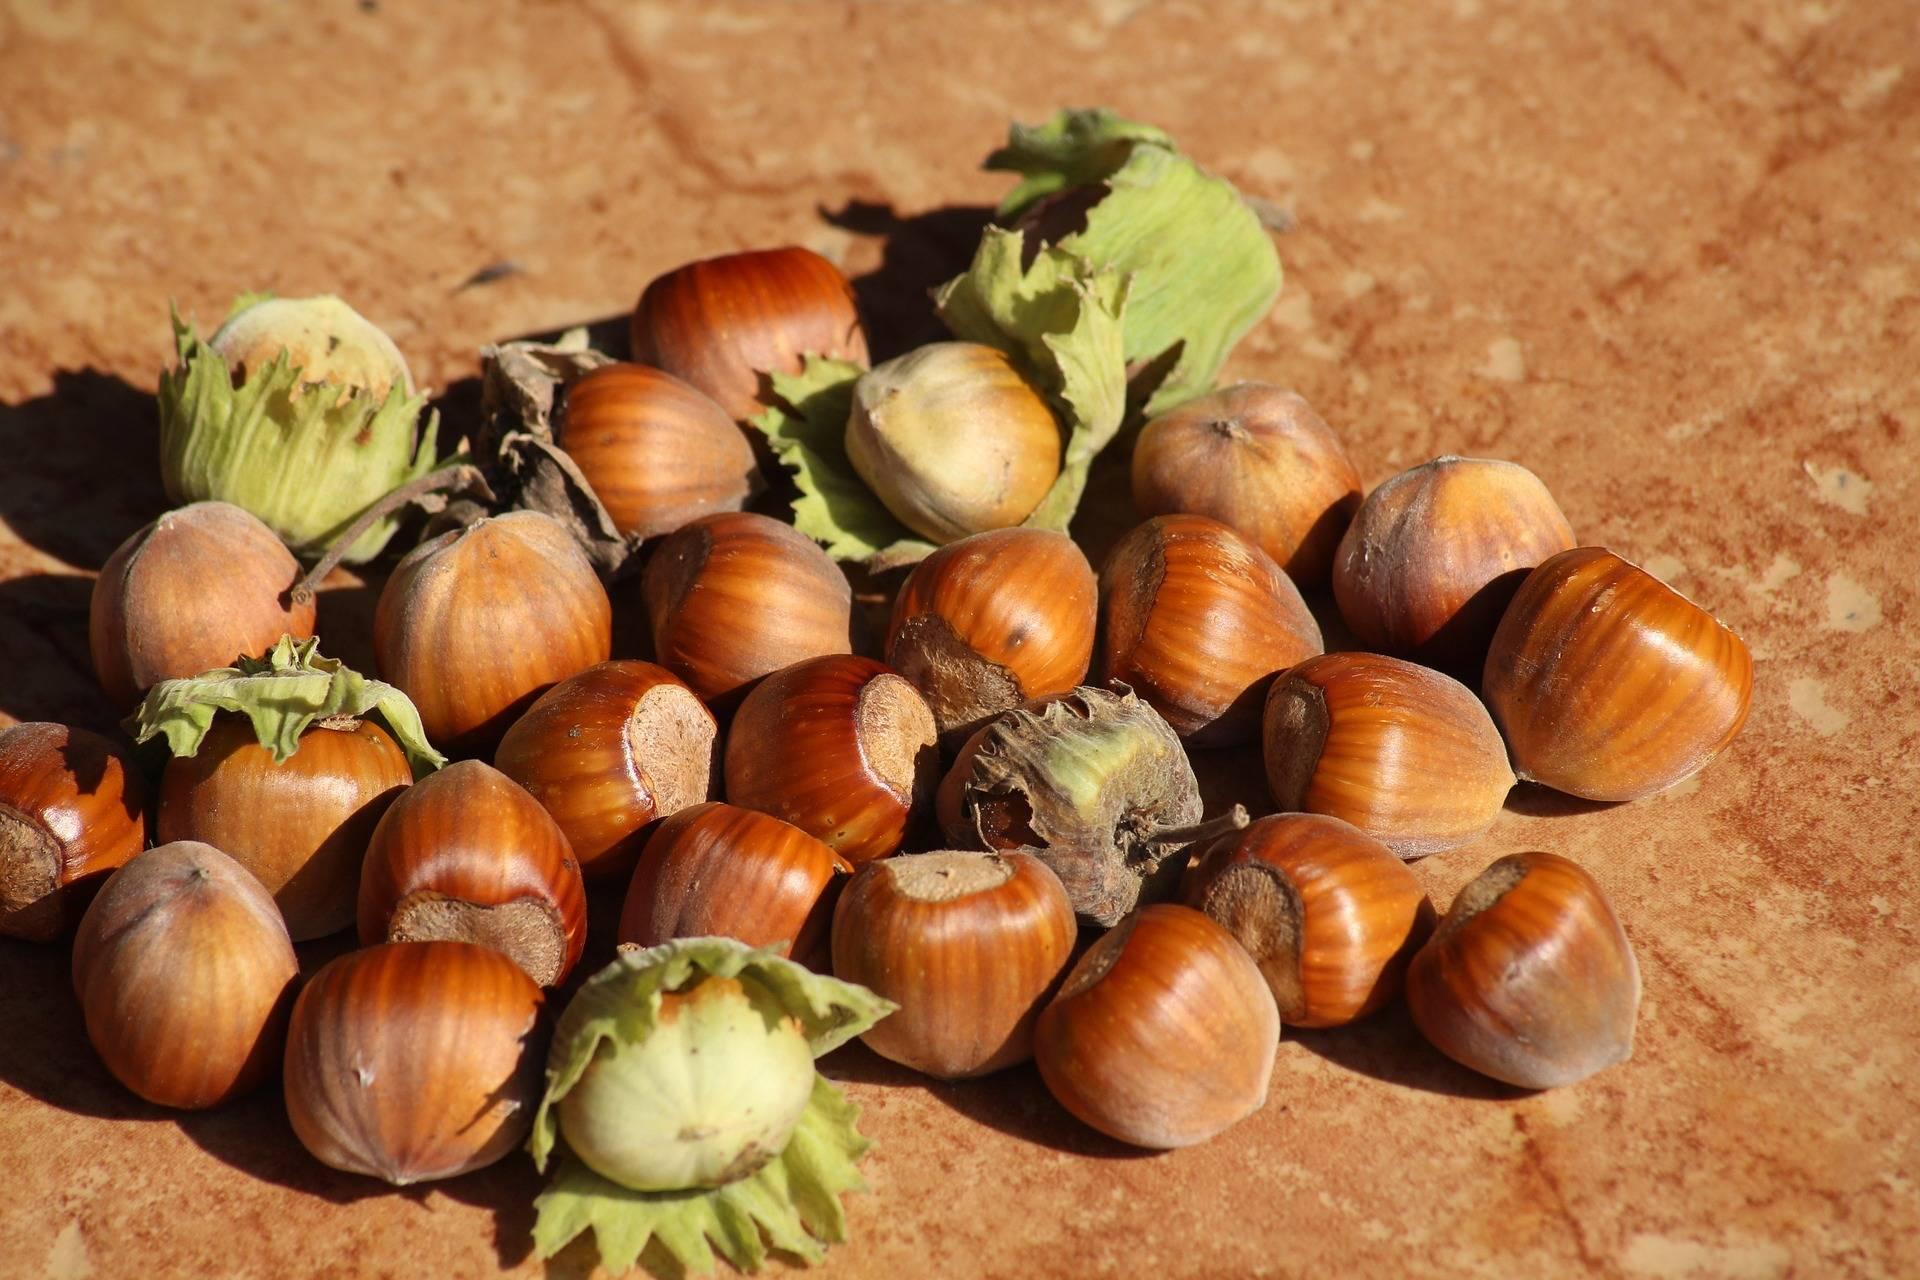 As small as a hazelnut